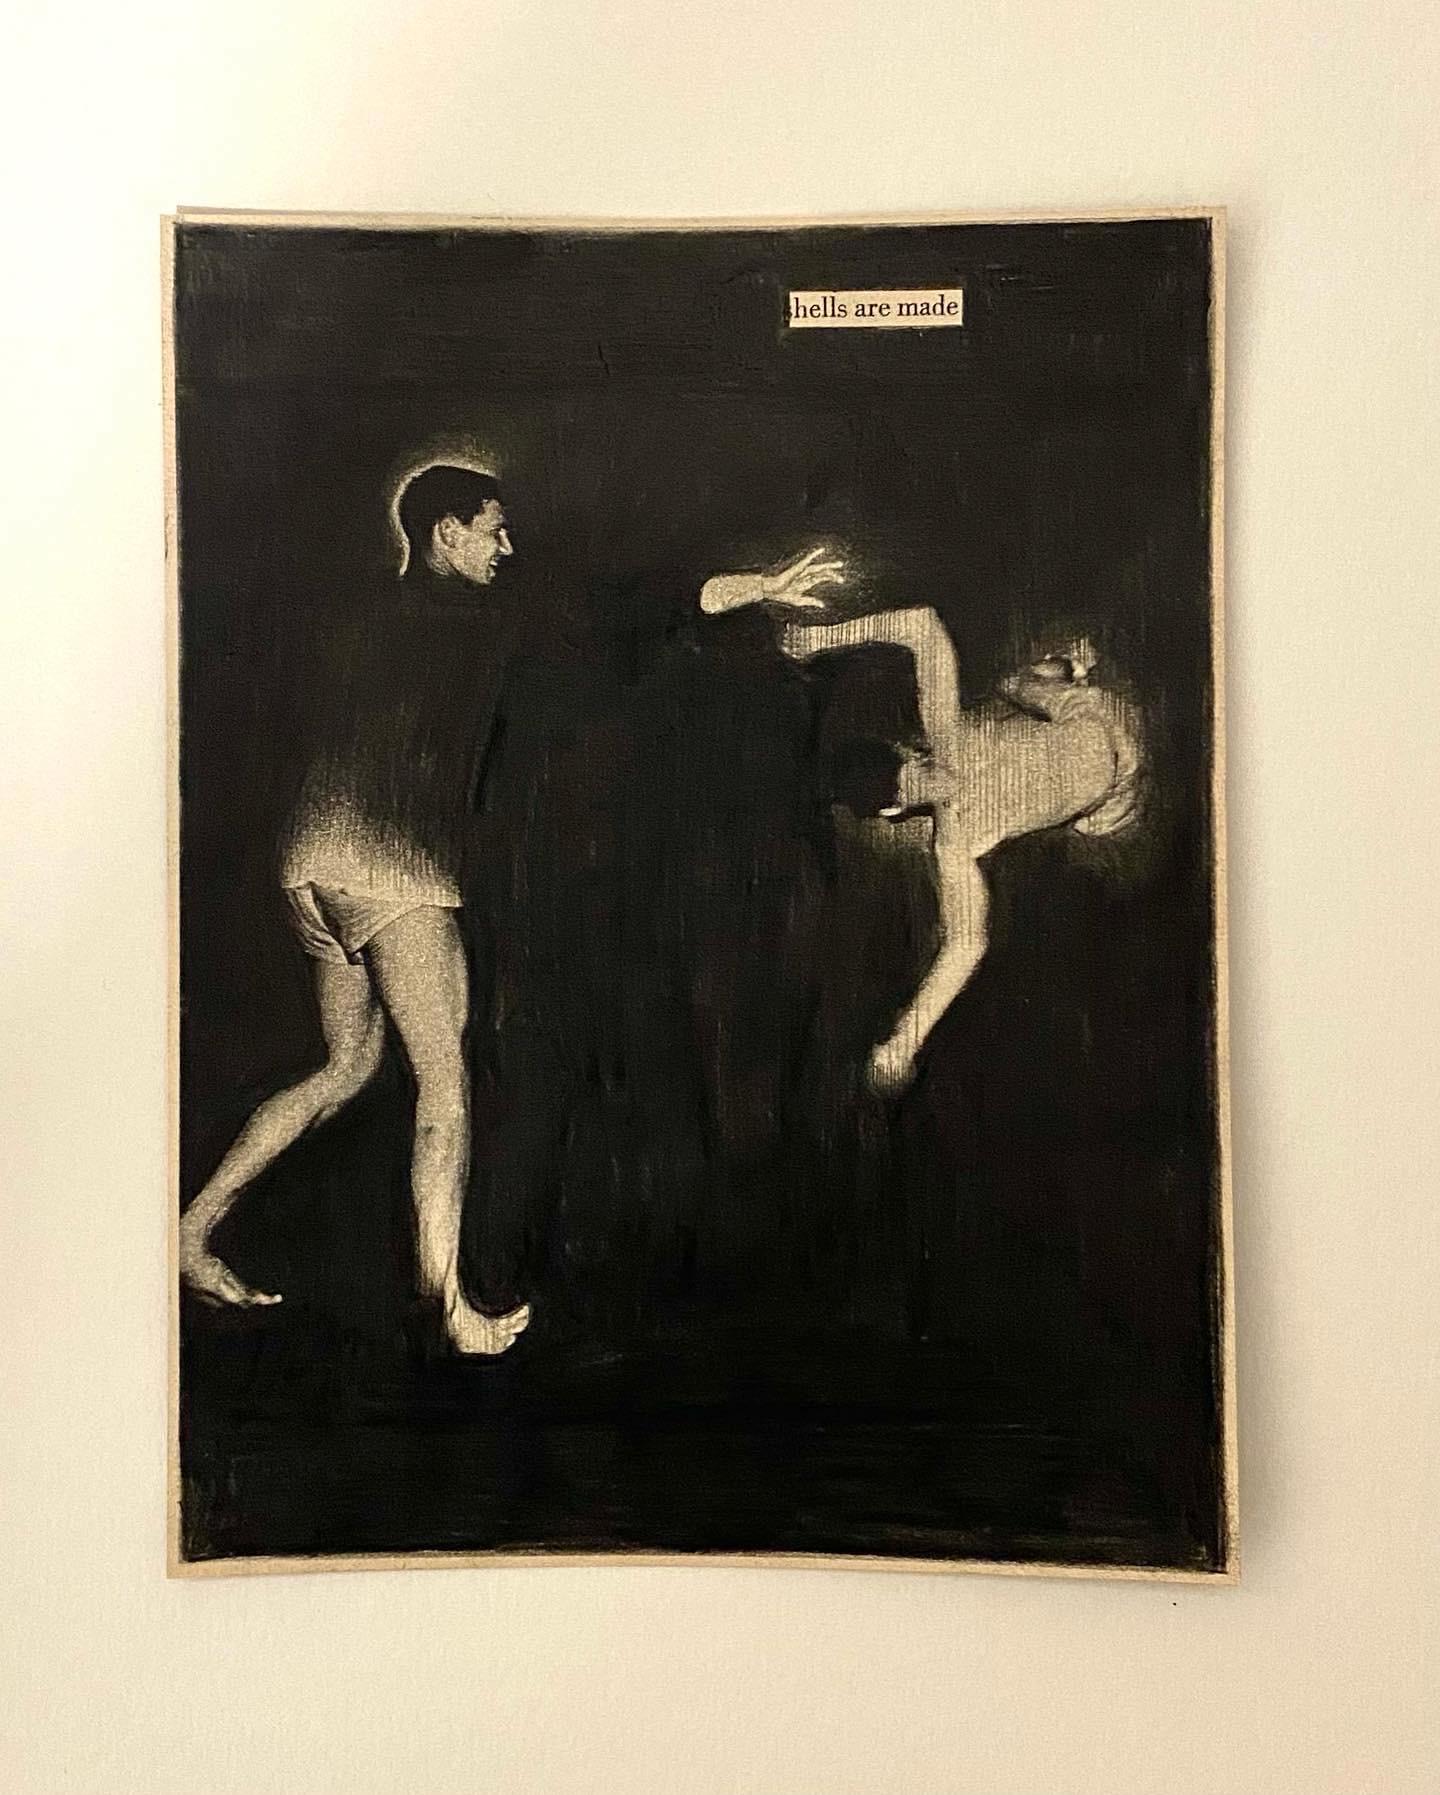 Black Pages Hells are made - 2021  Aquarelpotlood op magazine 8 x 11 cm   framed 650 € Interesse? Contacteer ons